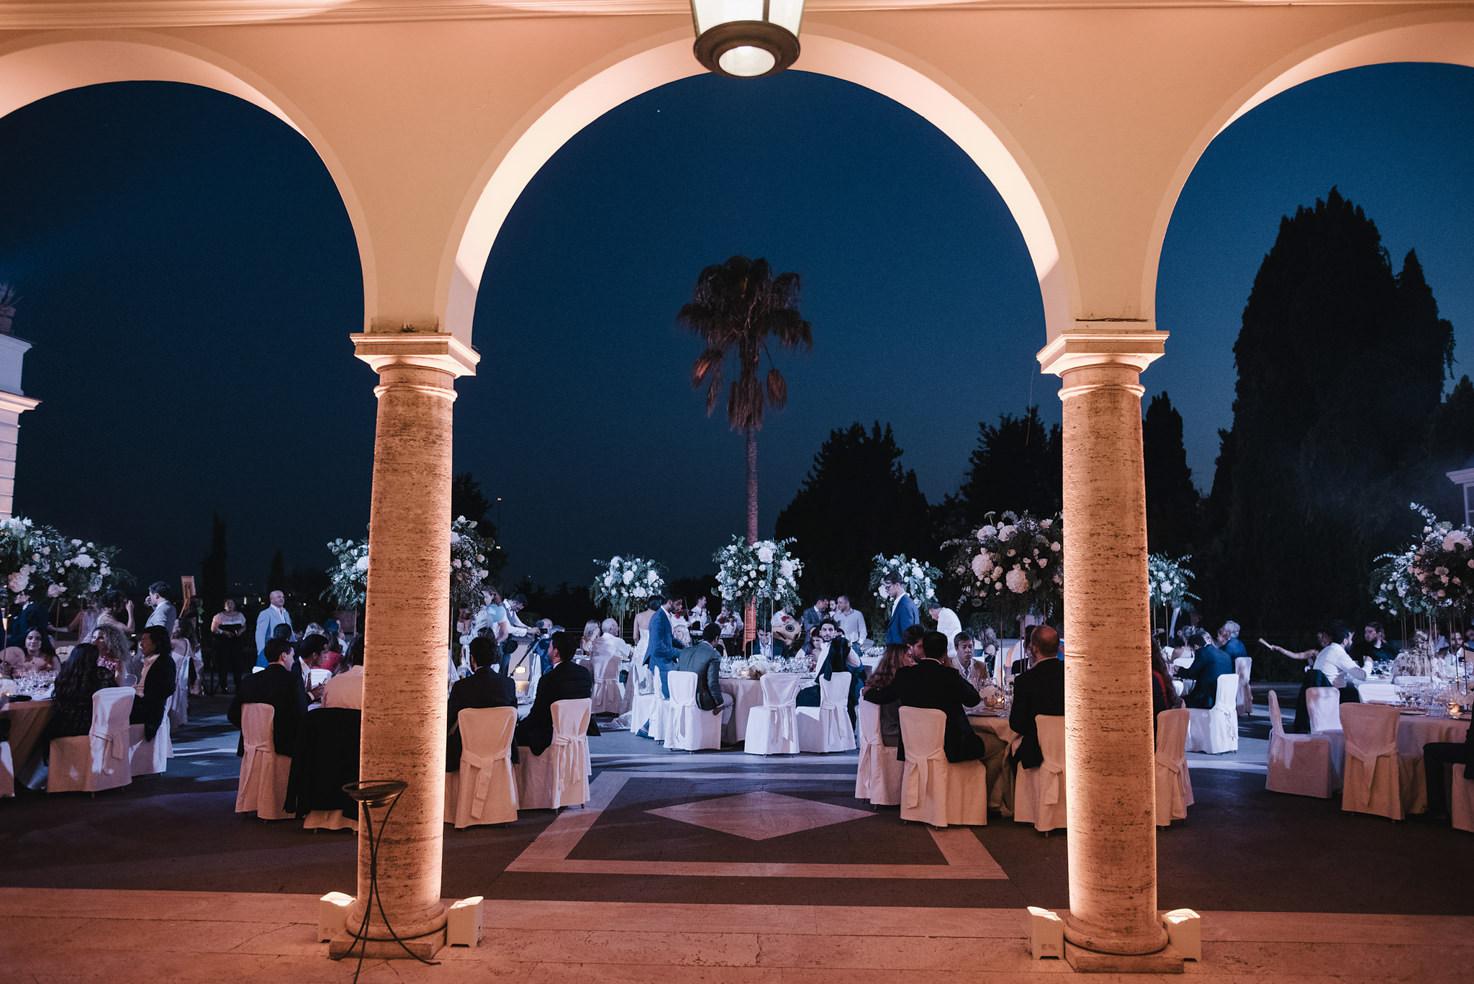 Wedding reception under the moon